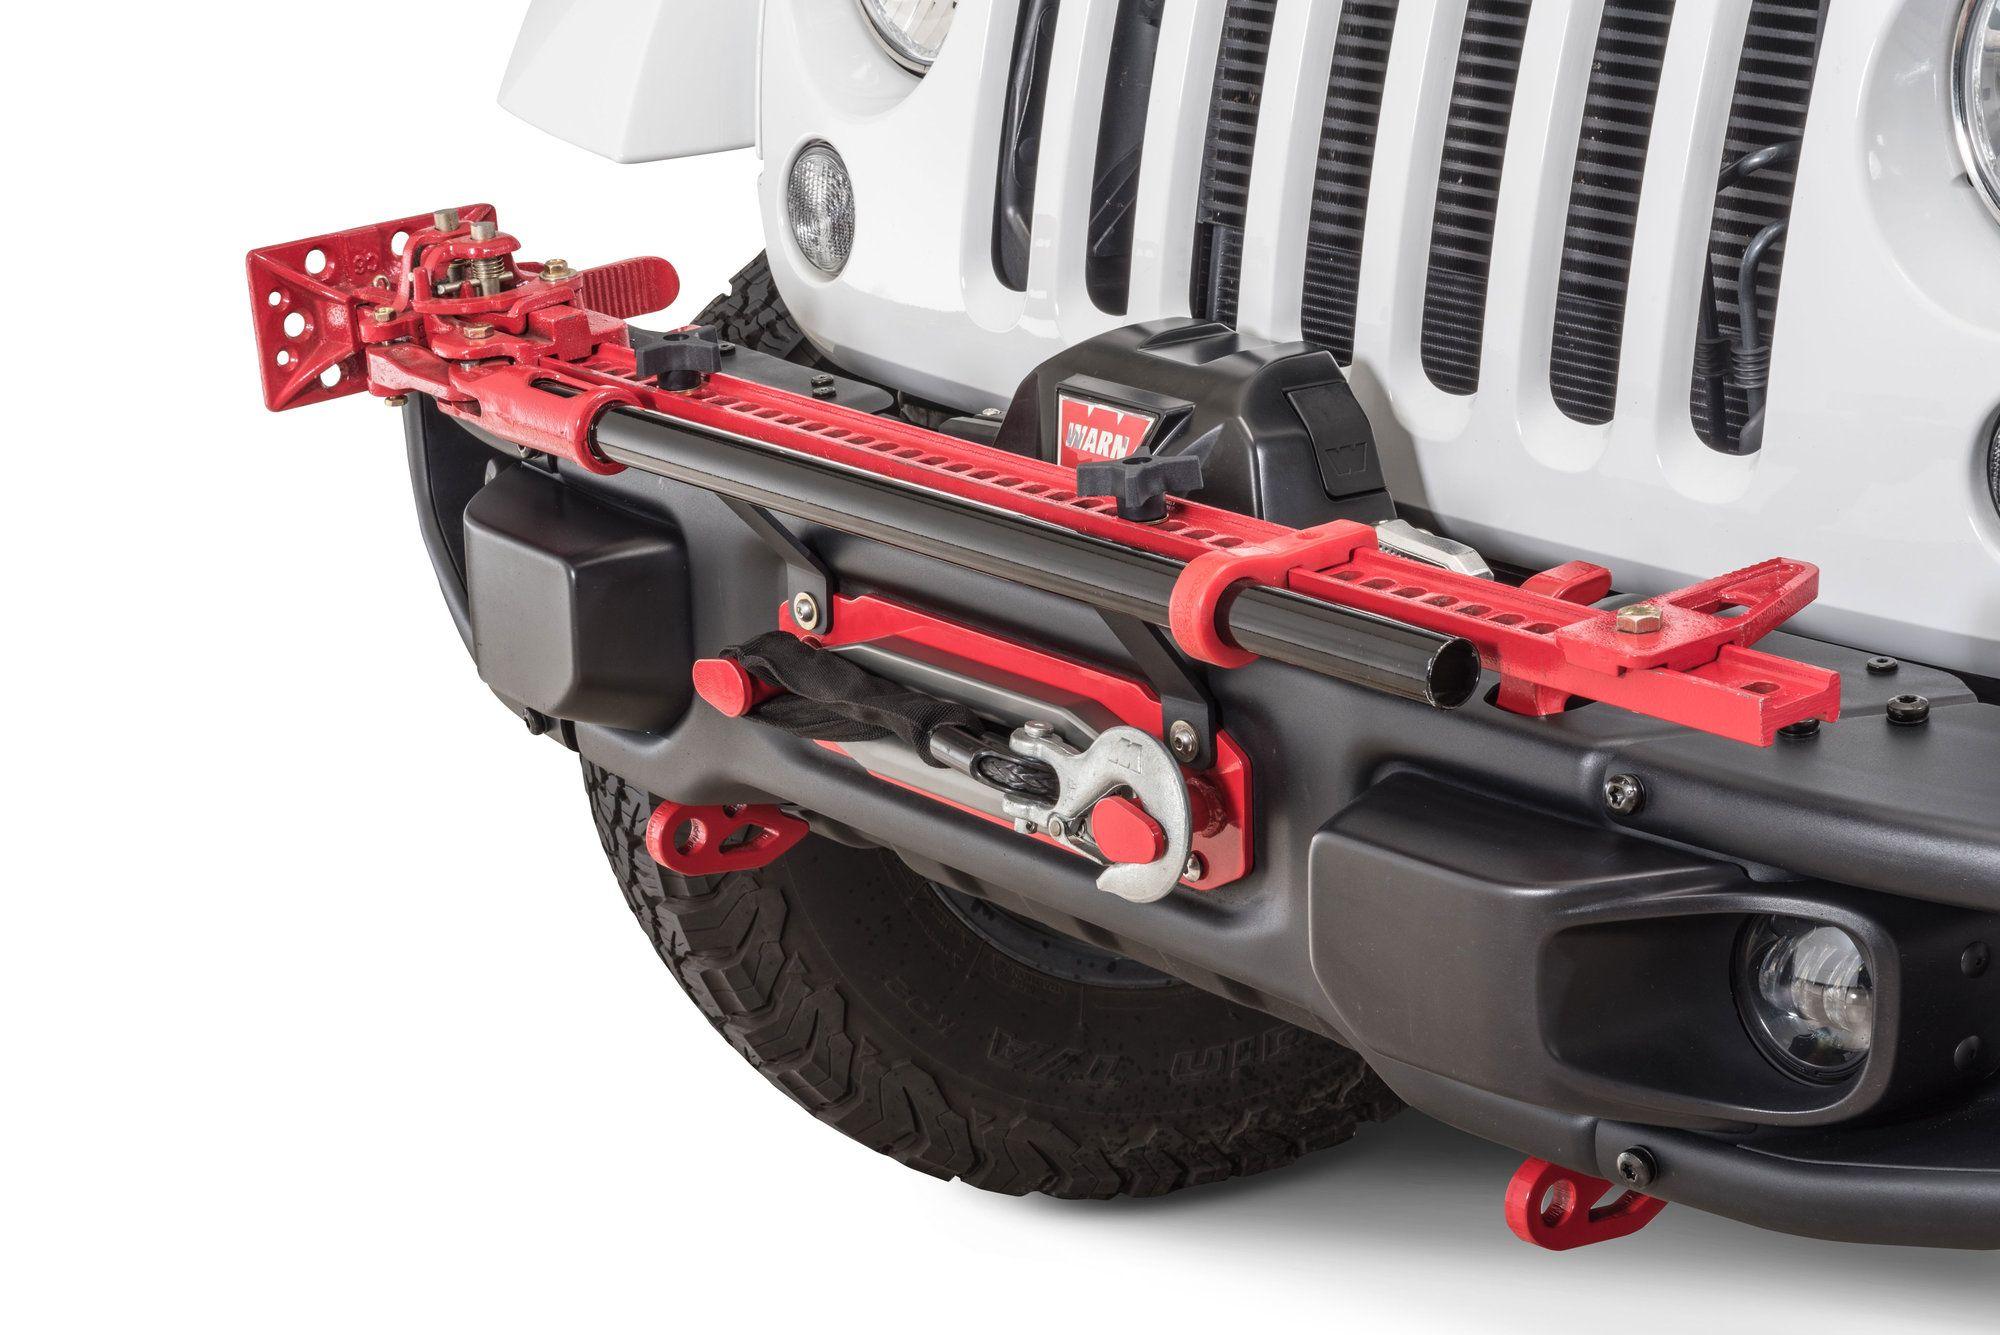 Maximus 3 0400 025 Fhjm Hi Lift Jack Mount For 13 17 Jeep Wrangler